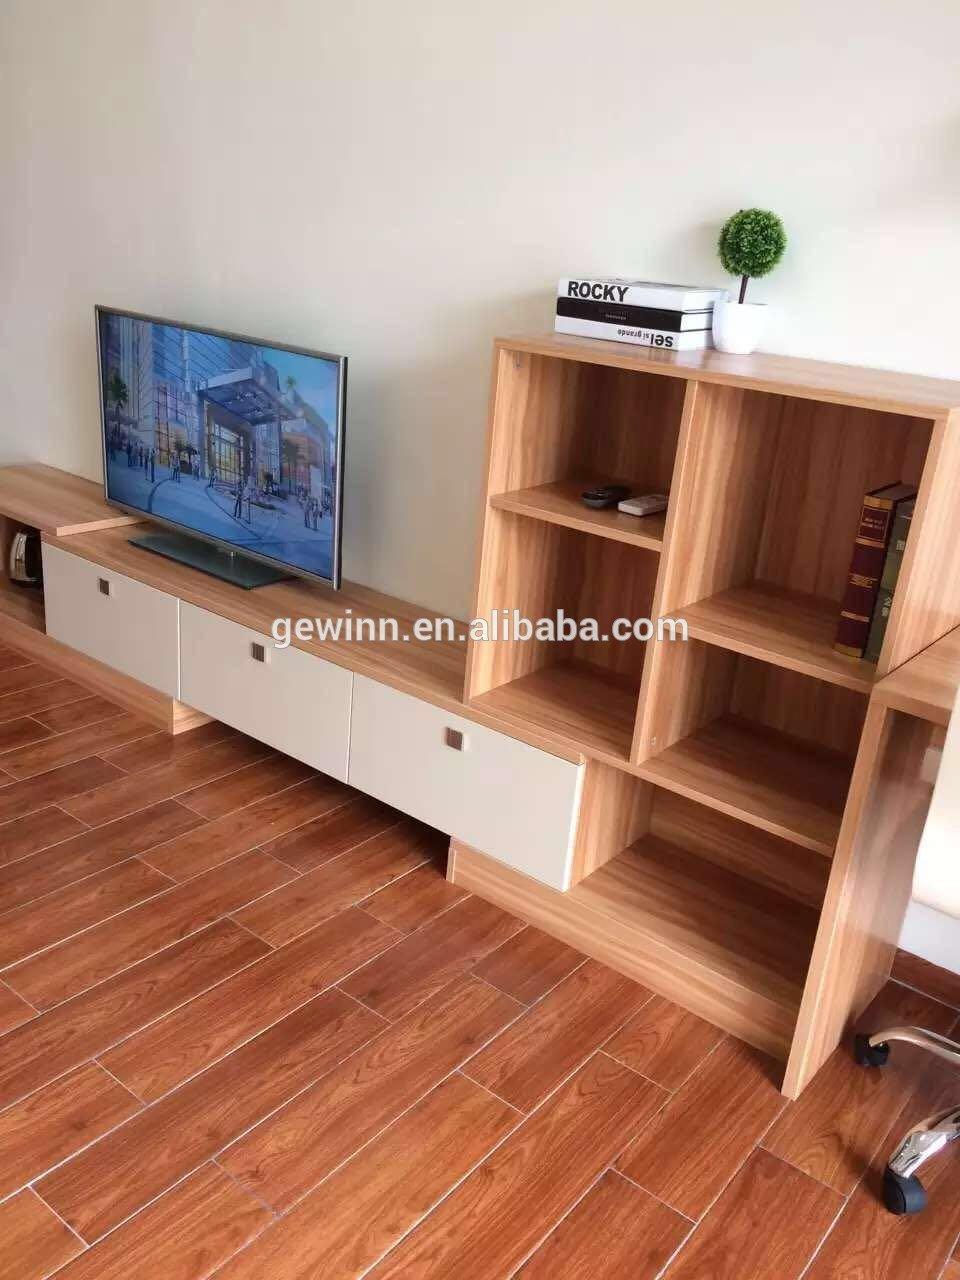 Gewinn high-quality woodworking equipment machine for sale-12